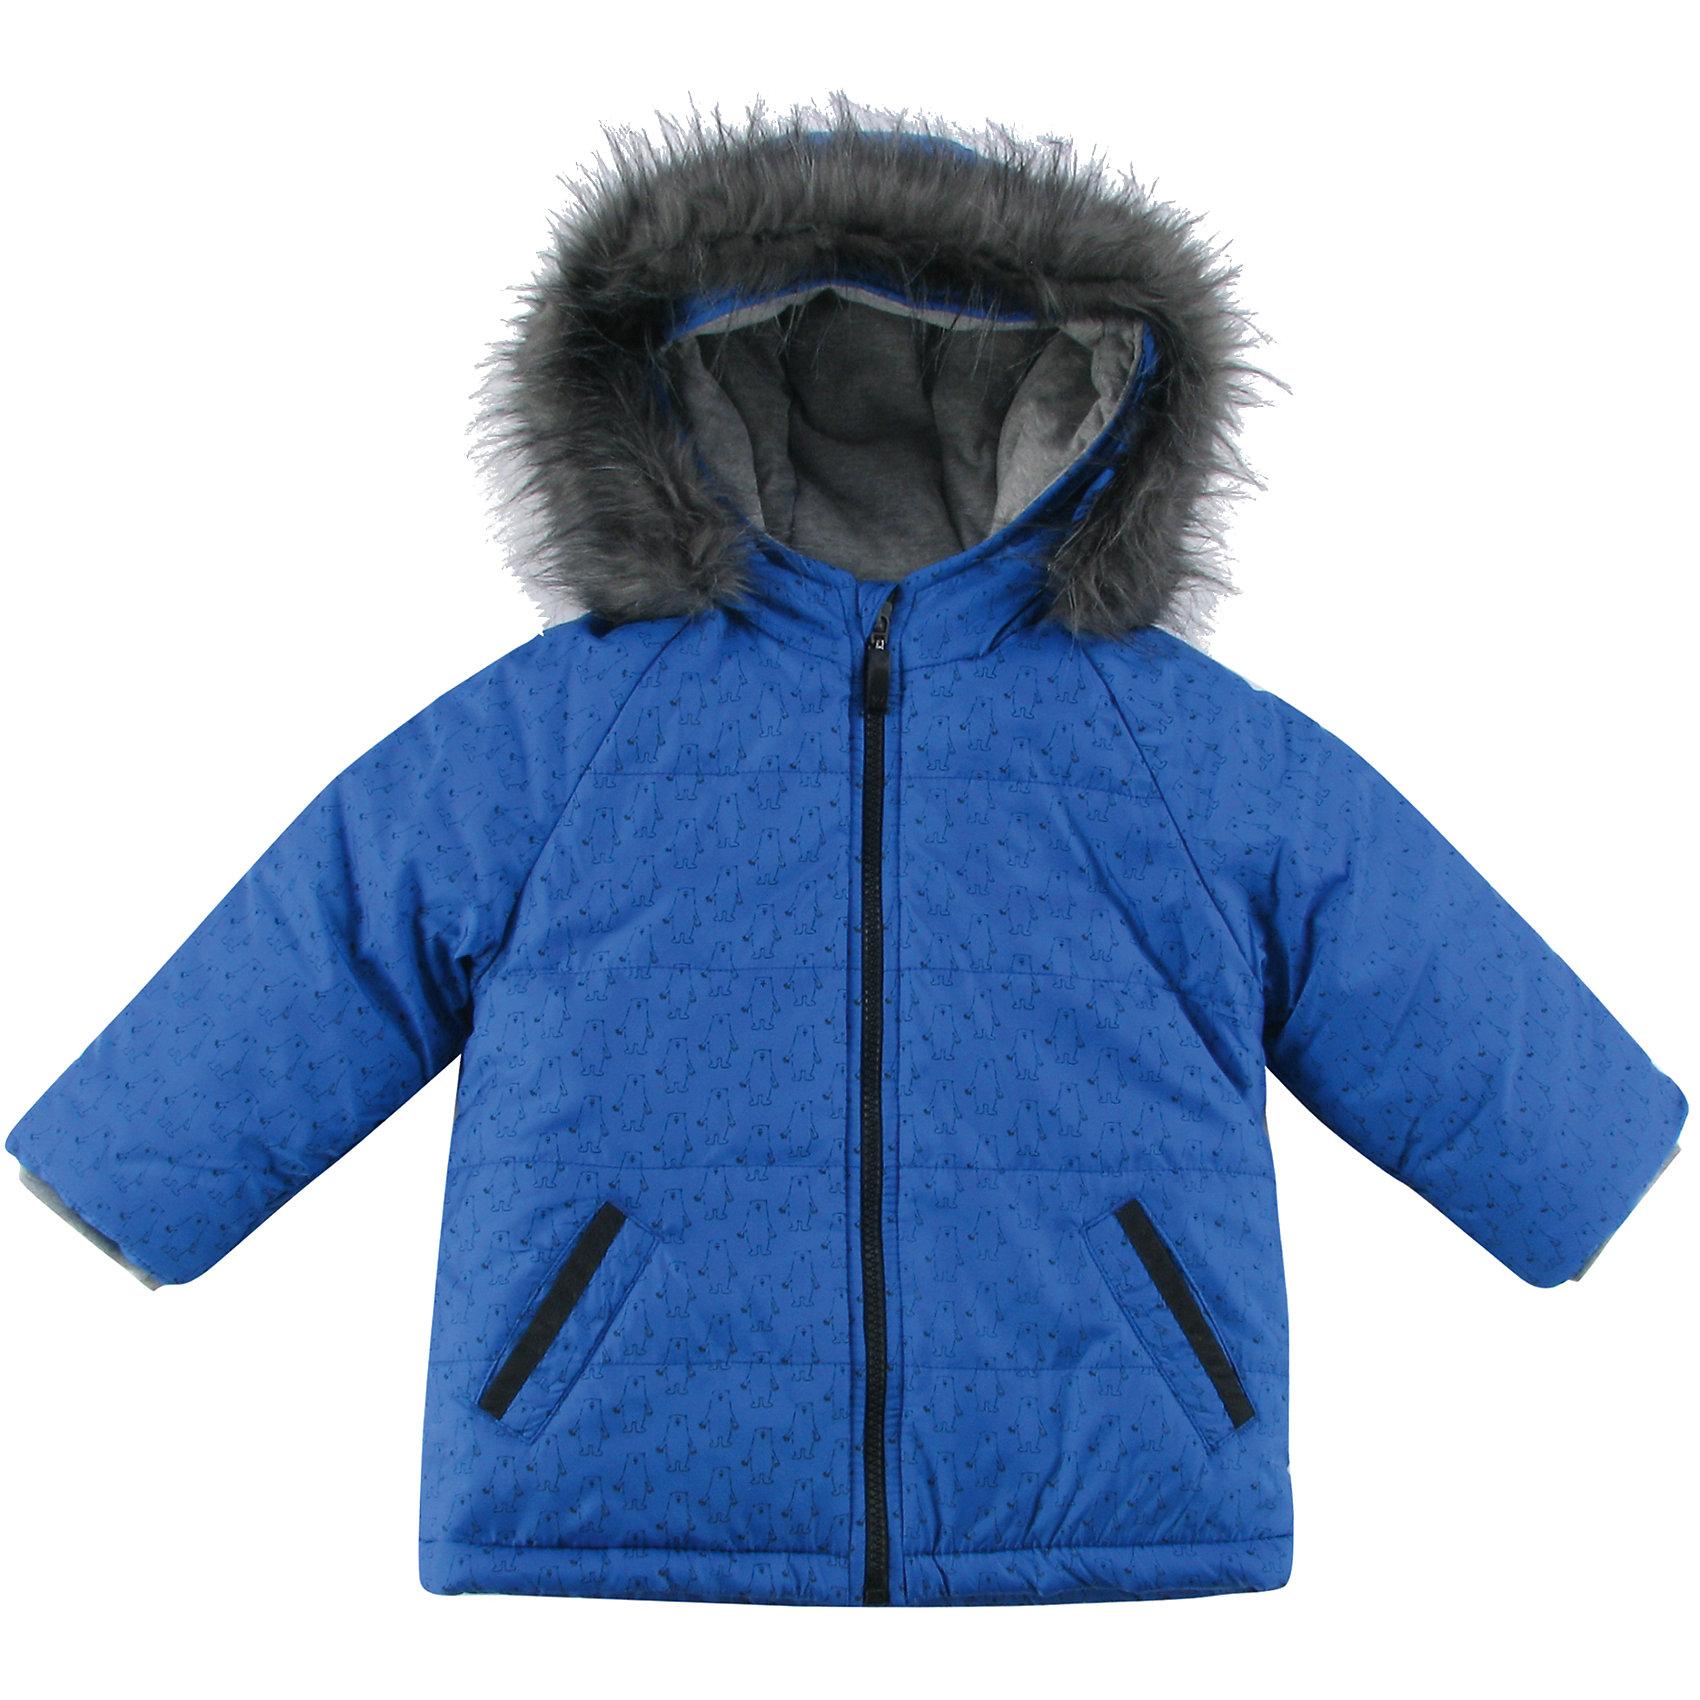 Куртка утепленная для мальчика WojcikВерхняя одежда<br>Куртка утепленная для мальчика Wojcik<br>Состав:<br>Полиэстер 100%<br><br>Ширина мм: 356<br>Глубина мм: 10<br>Высота мм: 245<br>Вес г: 519<br>Цвет: синий<br>Возраст от месяцев: 24<br>Возраст до месяцев: 36<br>Пол: Мужской<br>Возраст: Детский<br>Размер: 74,80,98,86,92<br>SKU: 5591849